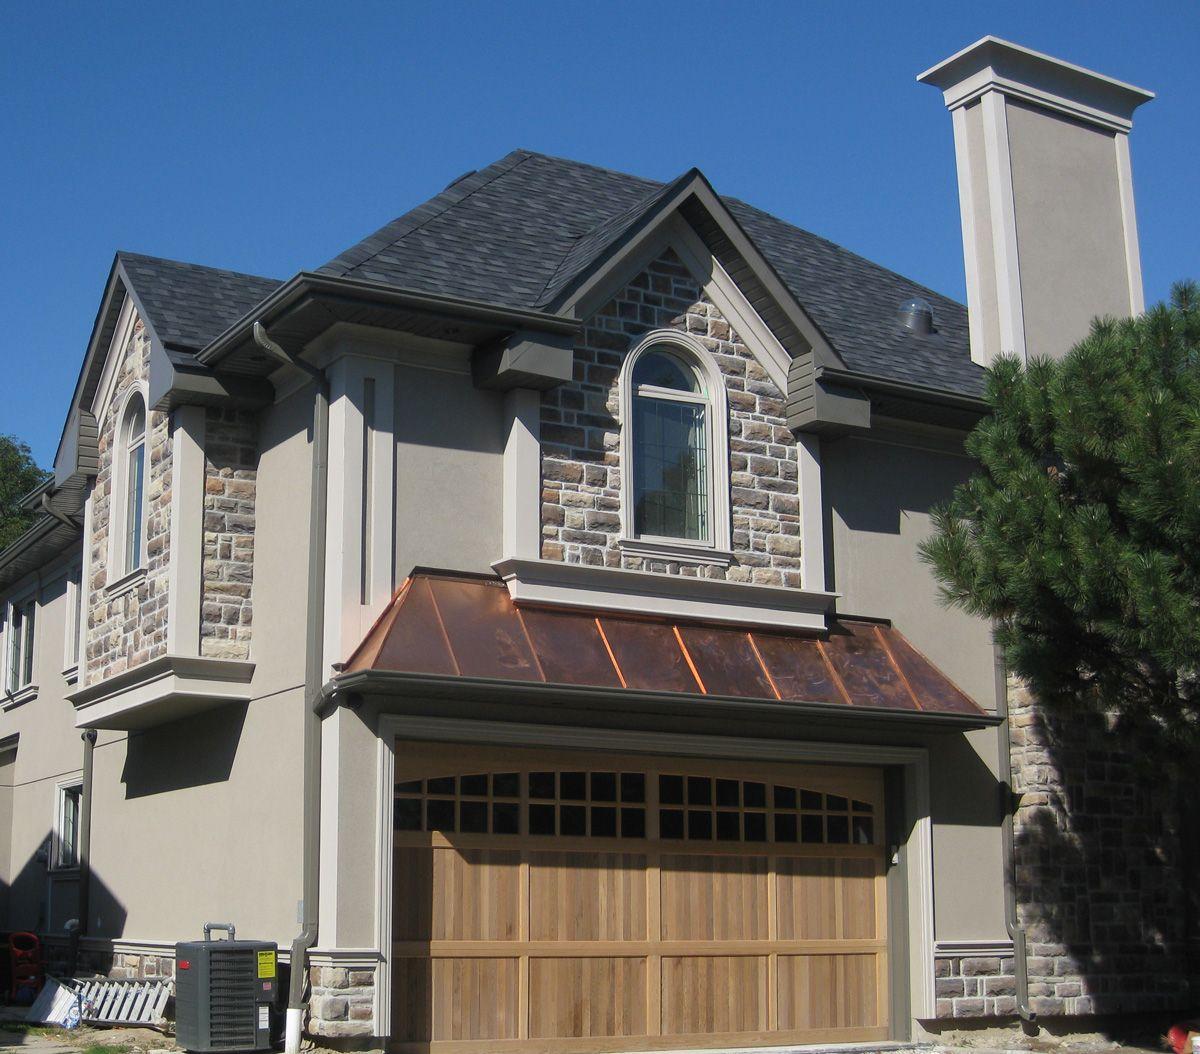 LIMESTONE-DRIFTWOOD-exterior-stone-veneers-FAUX STONE